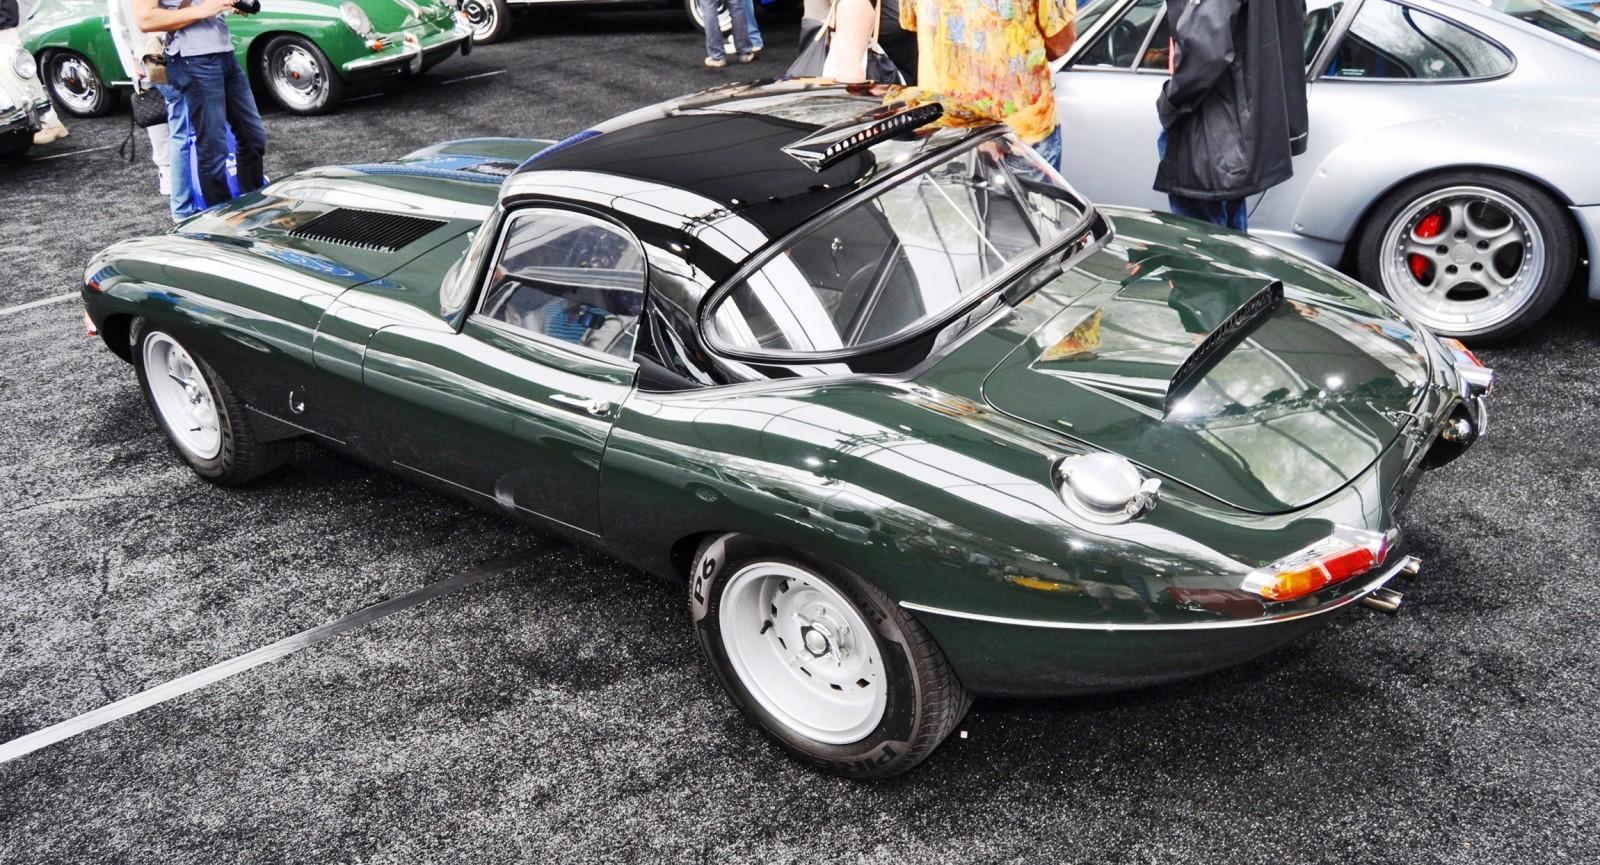 Une jaguar sachant freiner... - Page 6 1961-Jaguar-E-Type-Series-I-Lightweight-Replica-10-1600x865